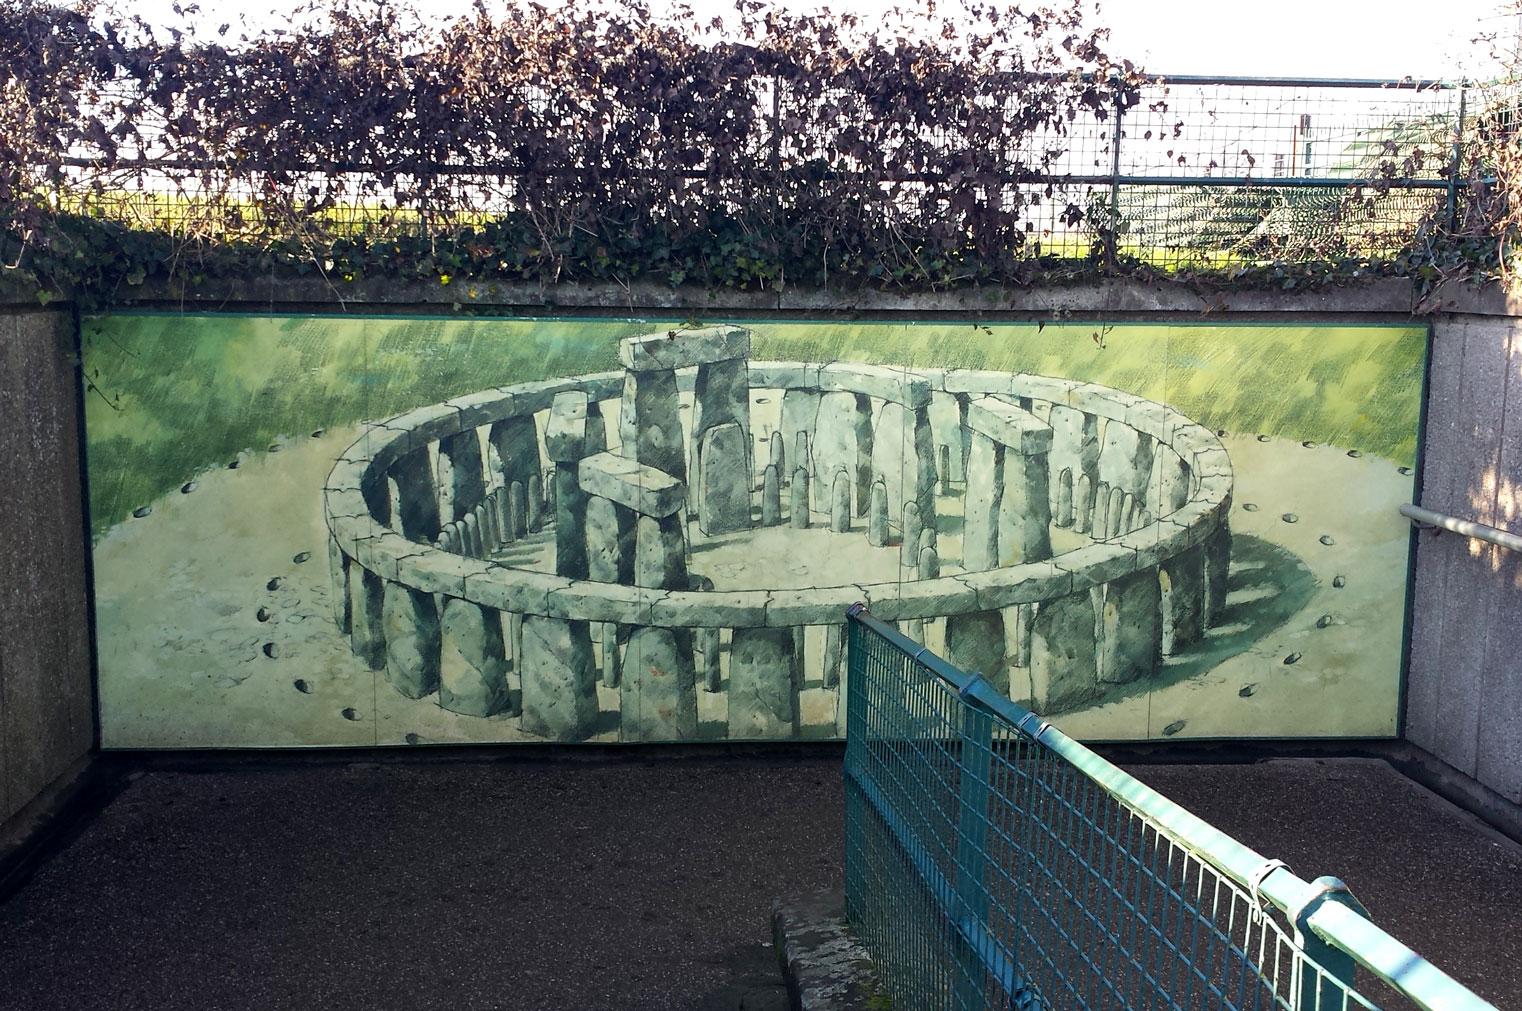 How Stonehenge looked in it's Heyday.